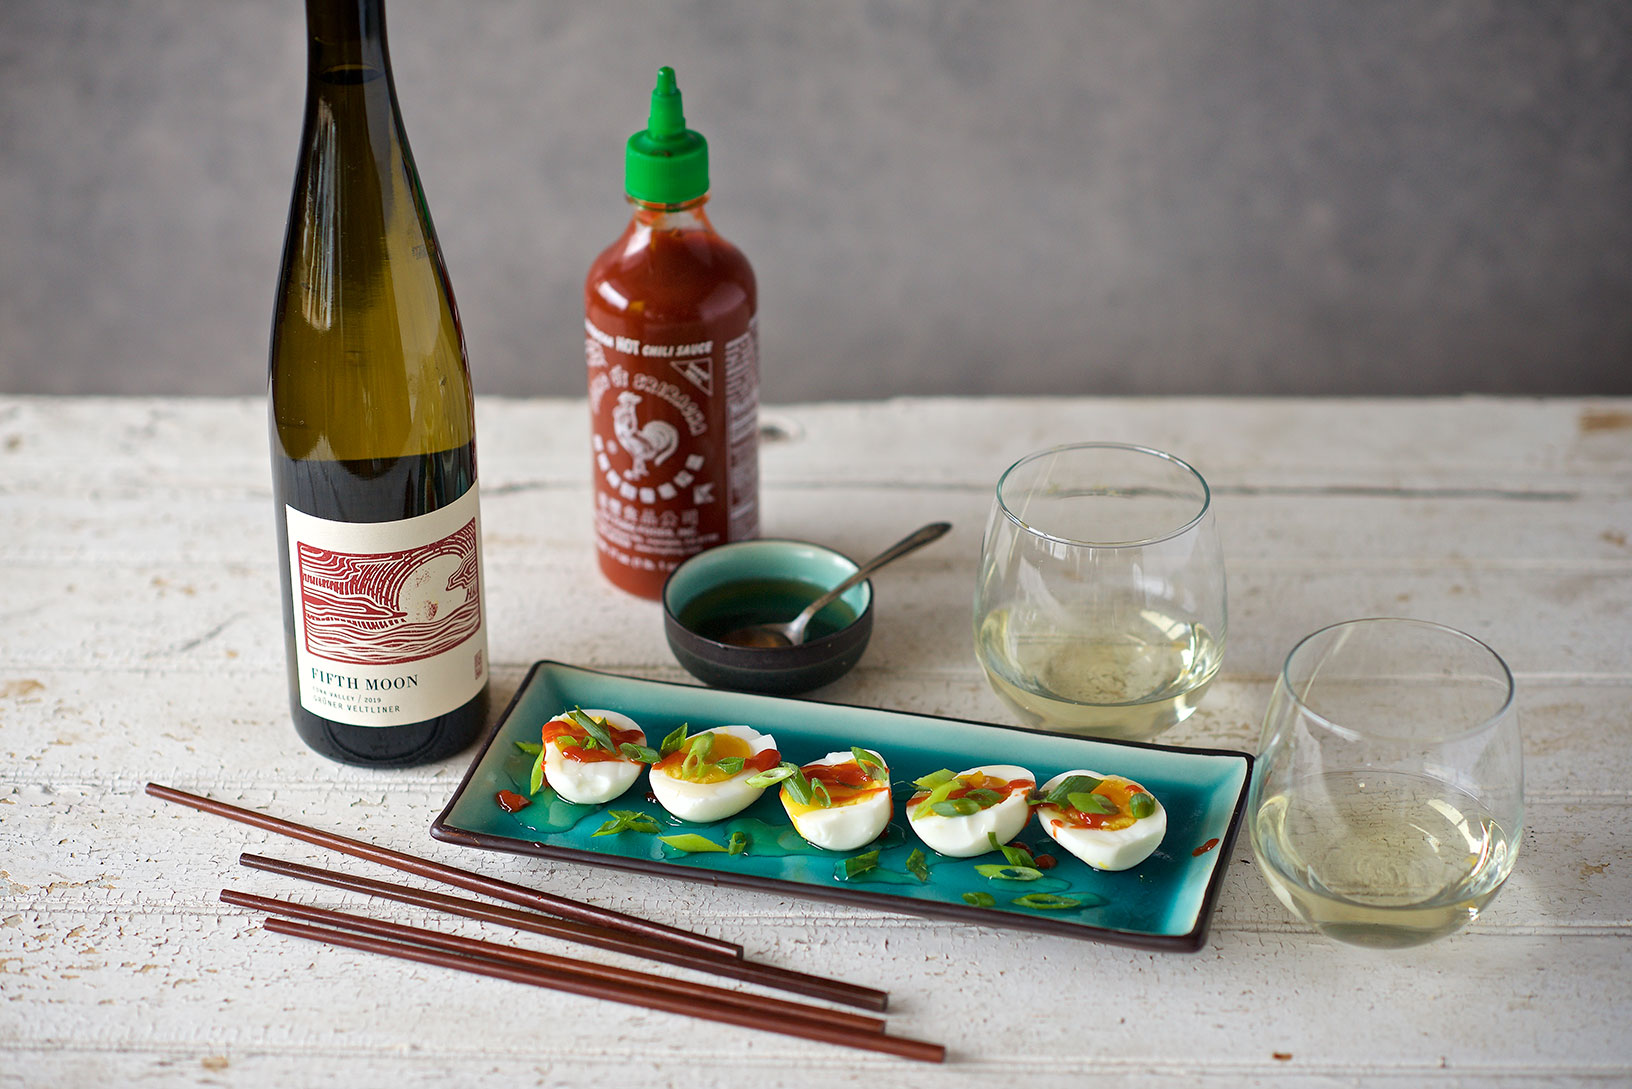 RD Winery Grüner Veltliner with 6-Minute Eggs